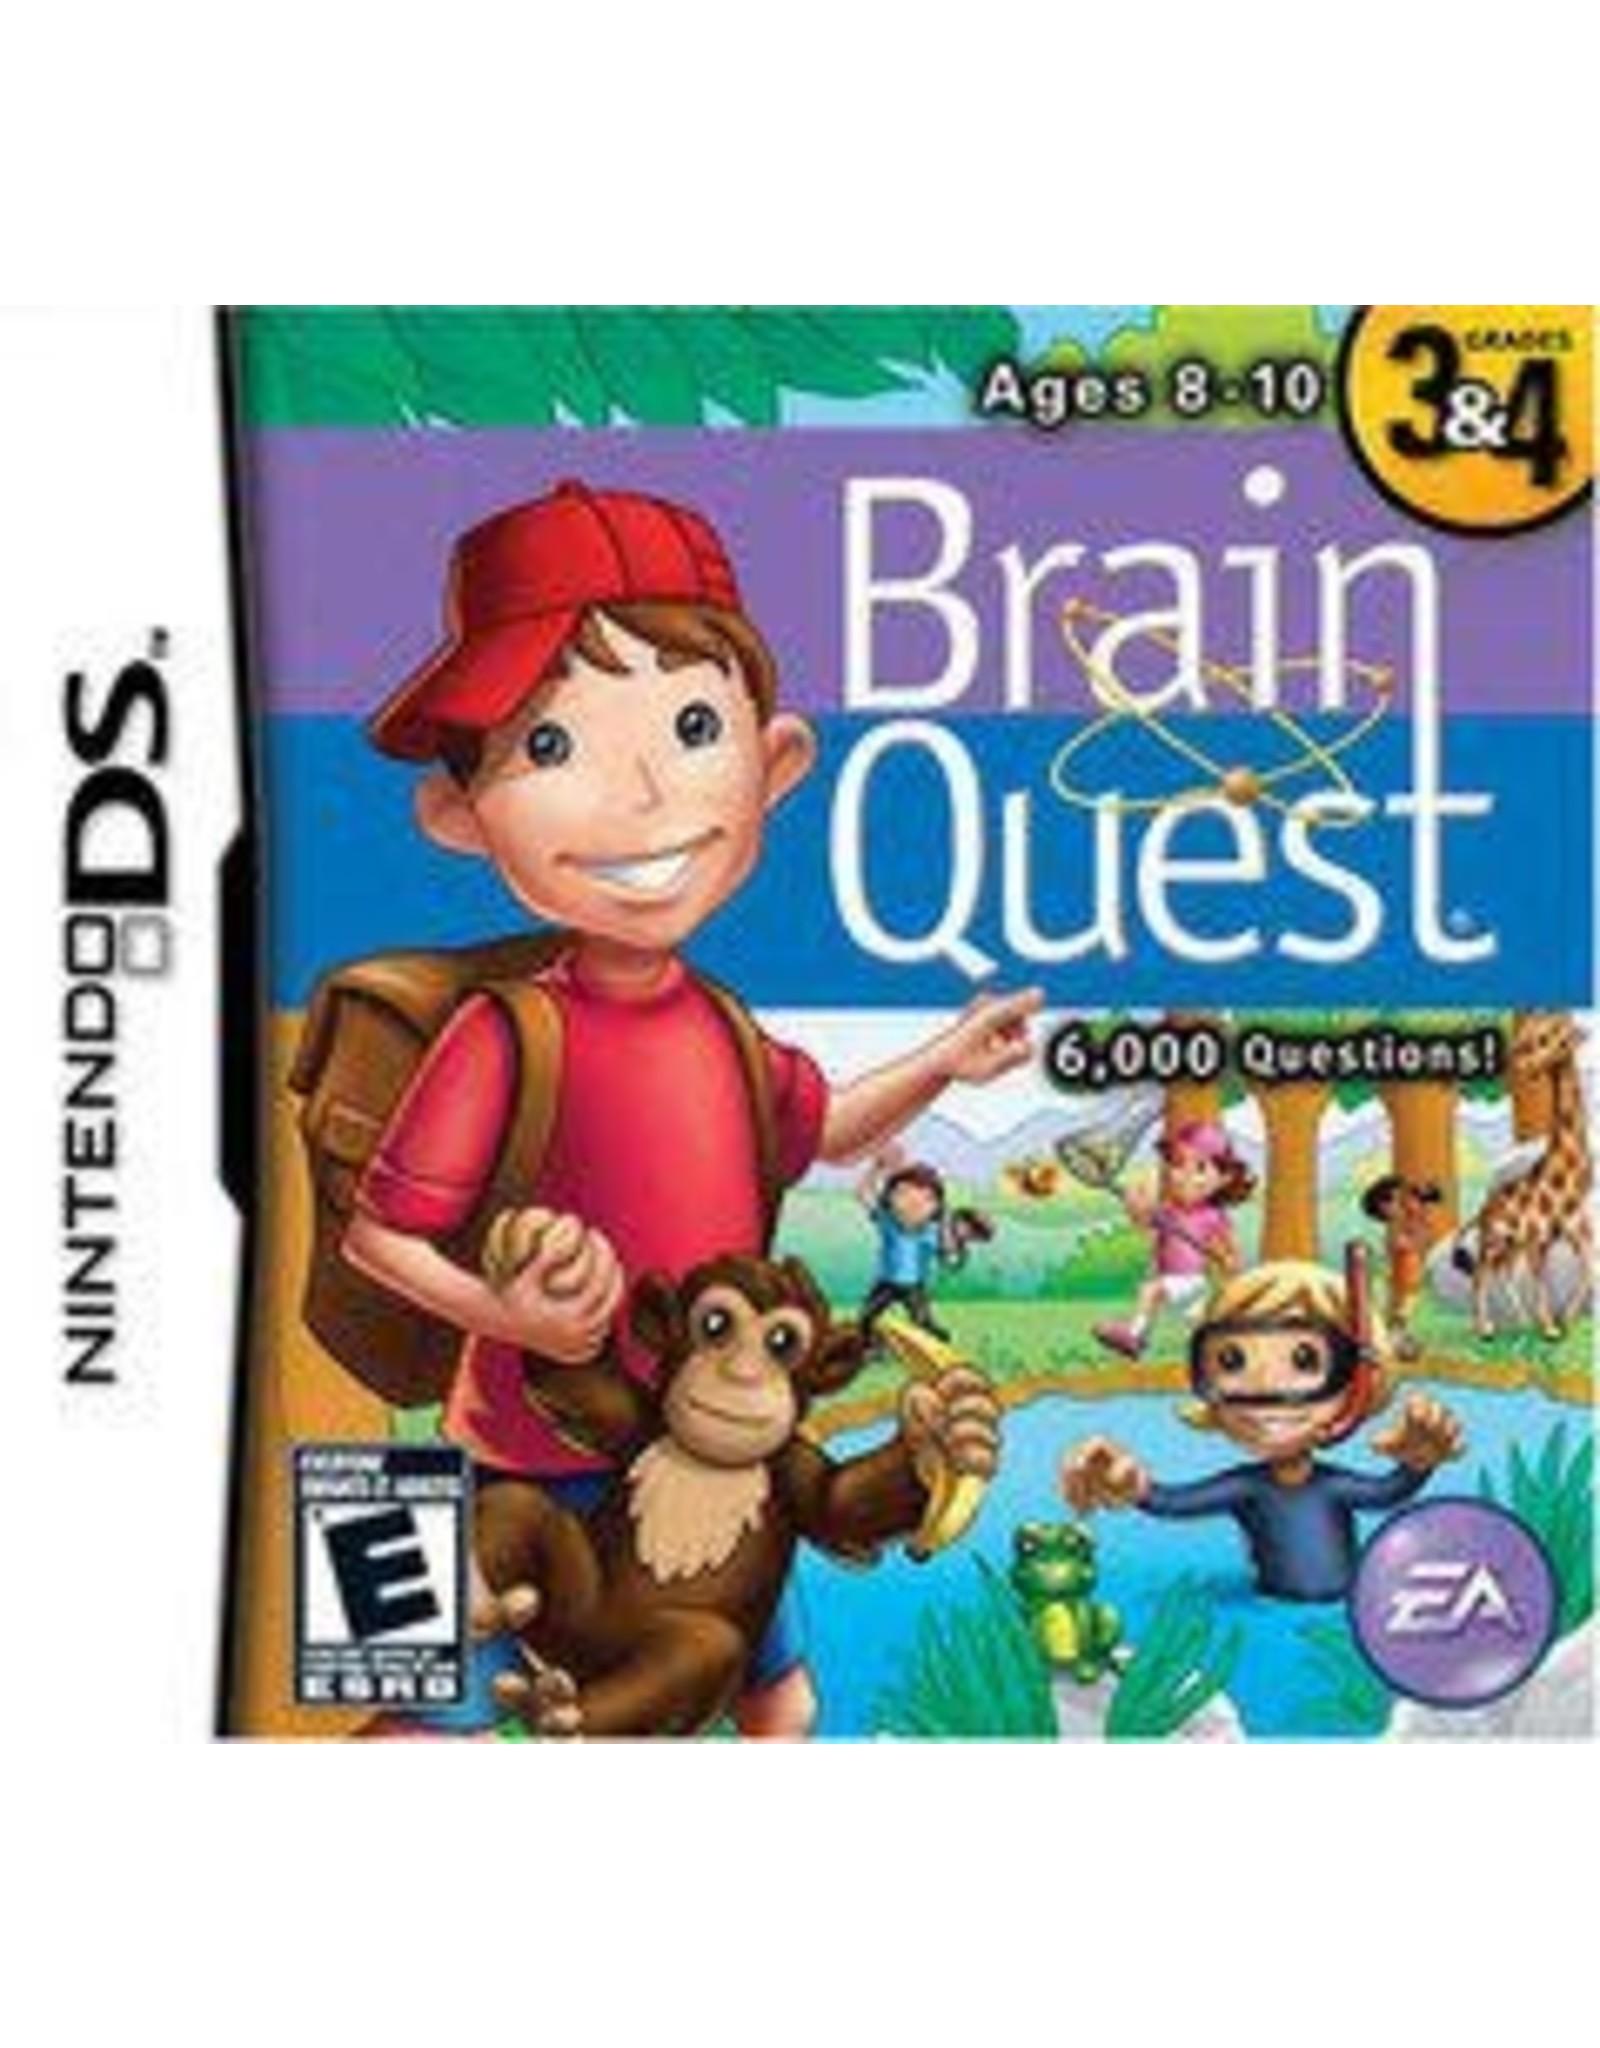 Nintendo DS Brain Quest Grades 3 & 4 (Water Damaged)